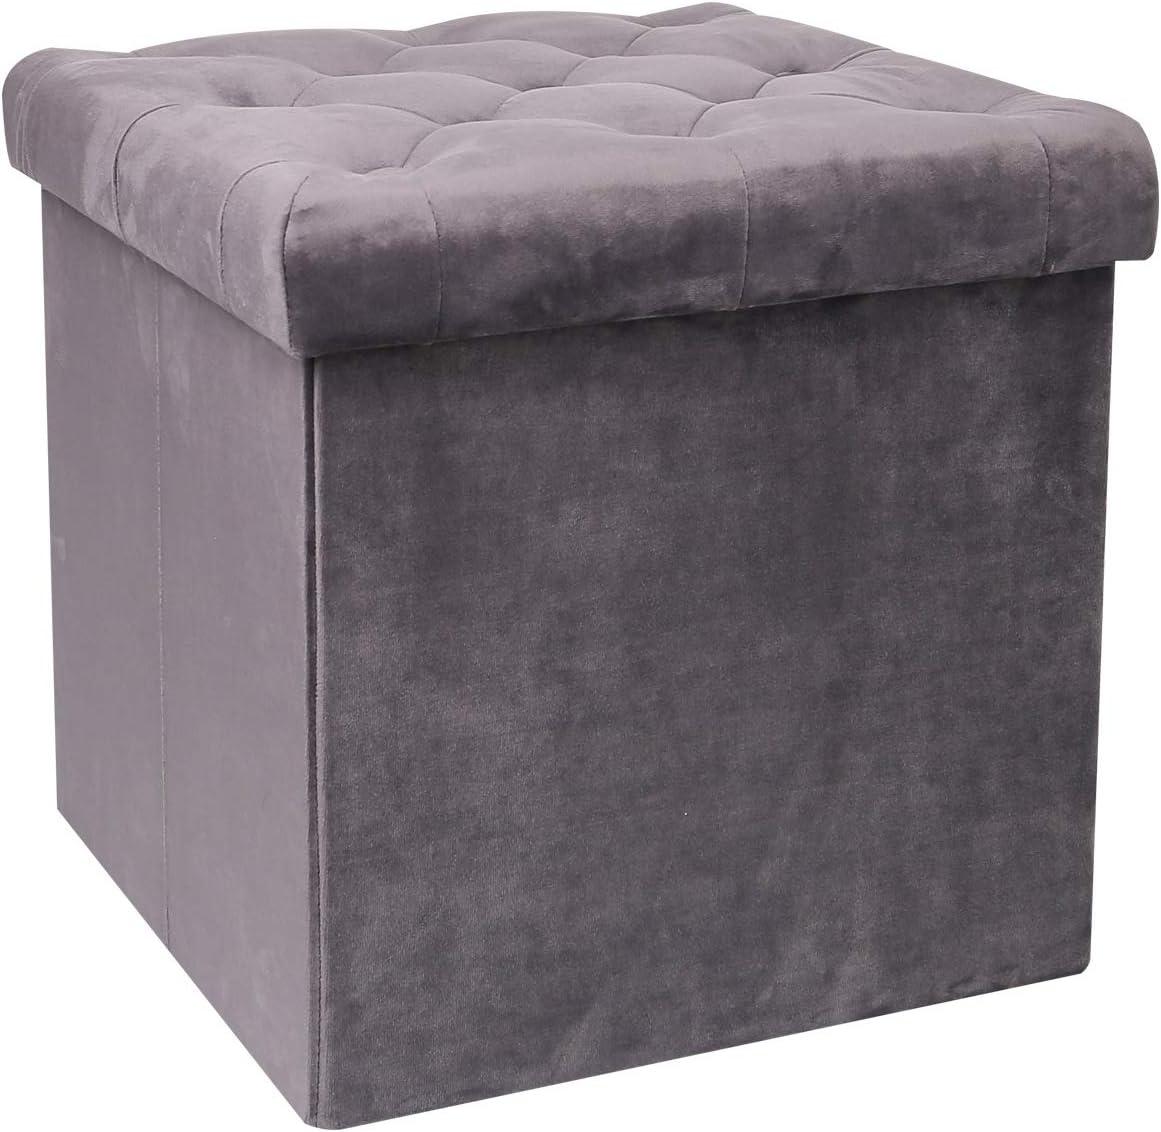 It is very popular B FSOBEIIALEO Storage Ottoman Cube Folding Max 61% OFF Velvet Tufted Ottoma